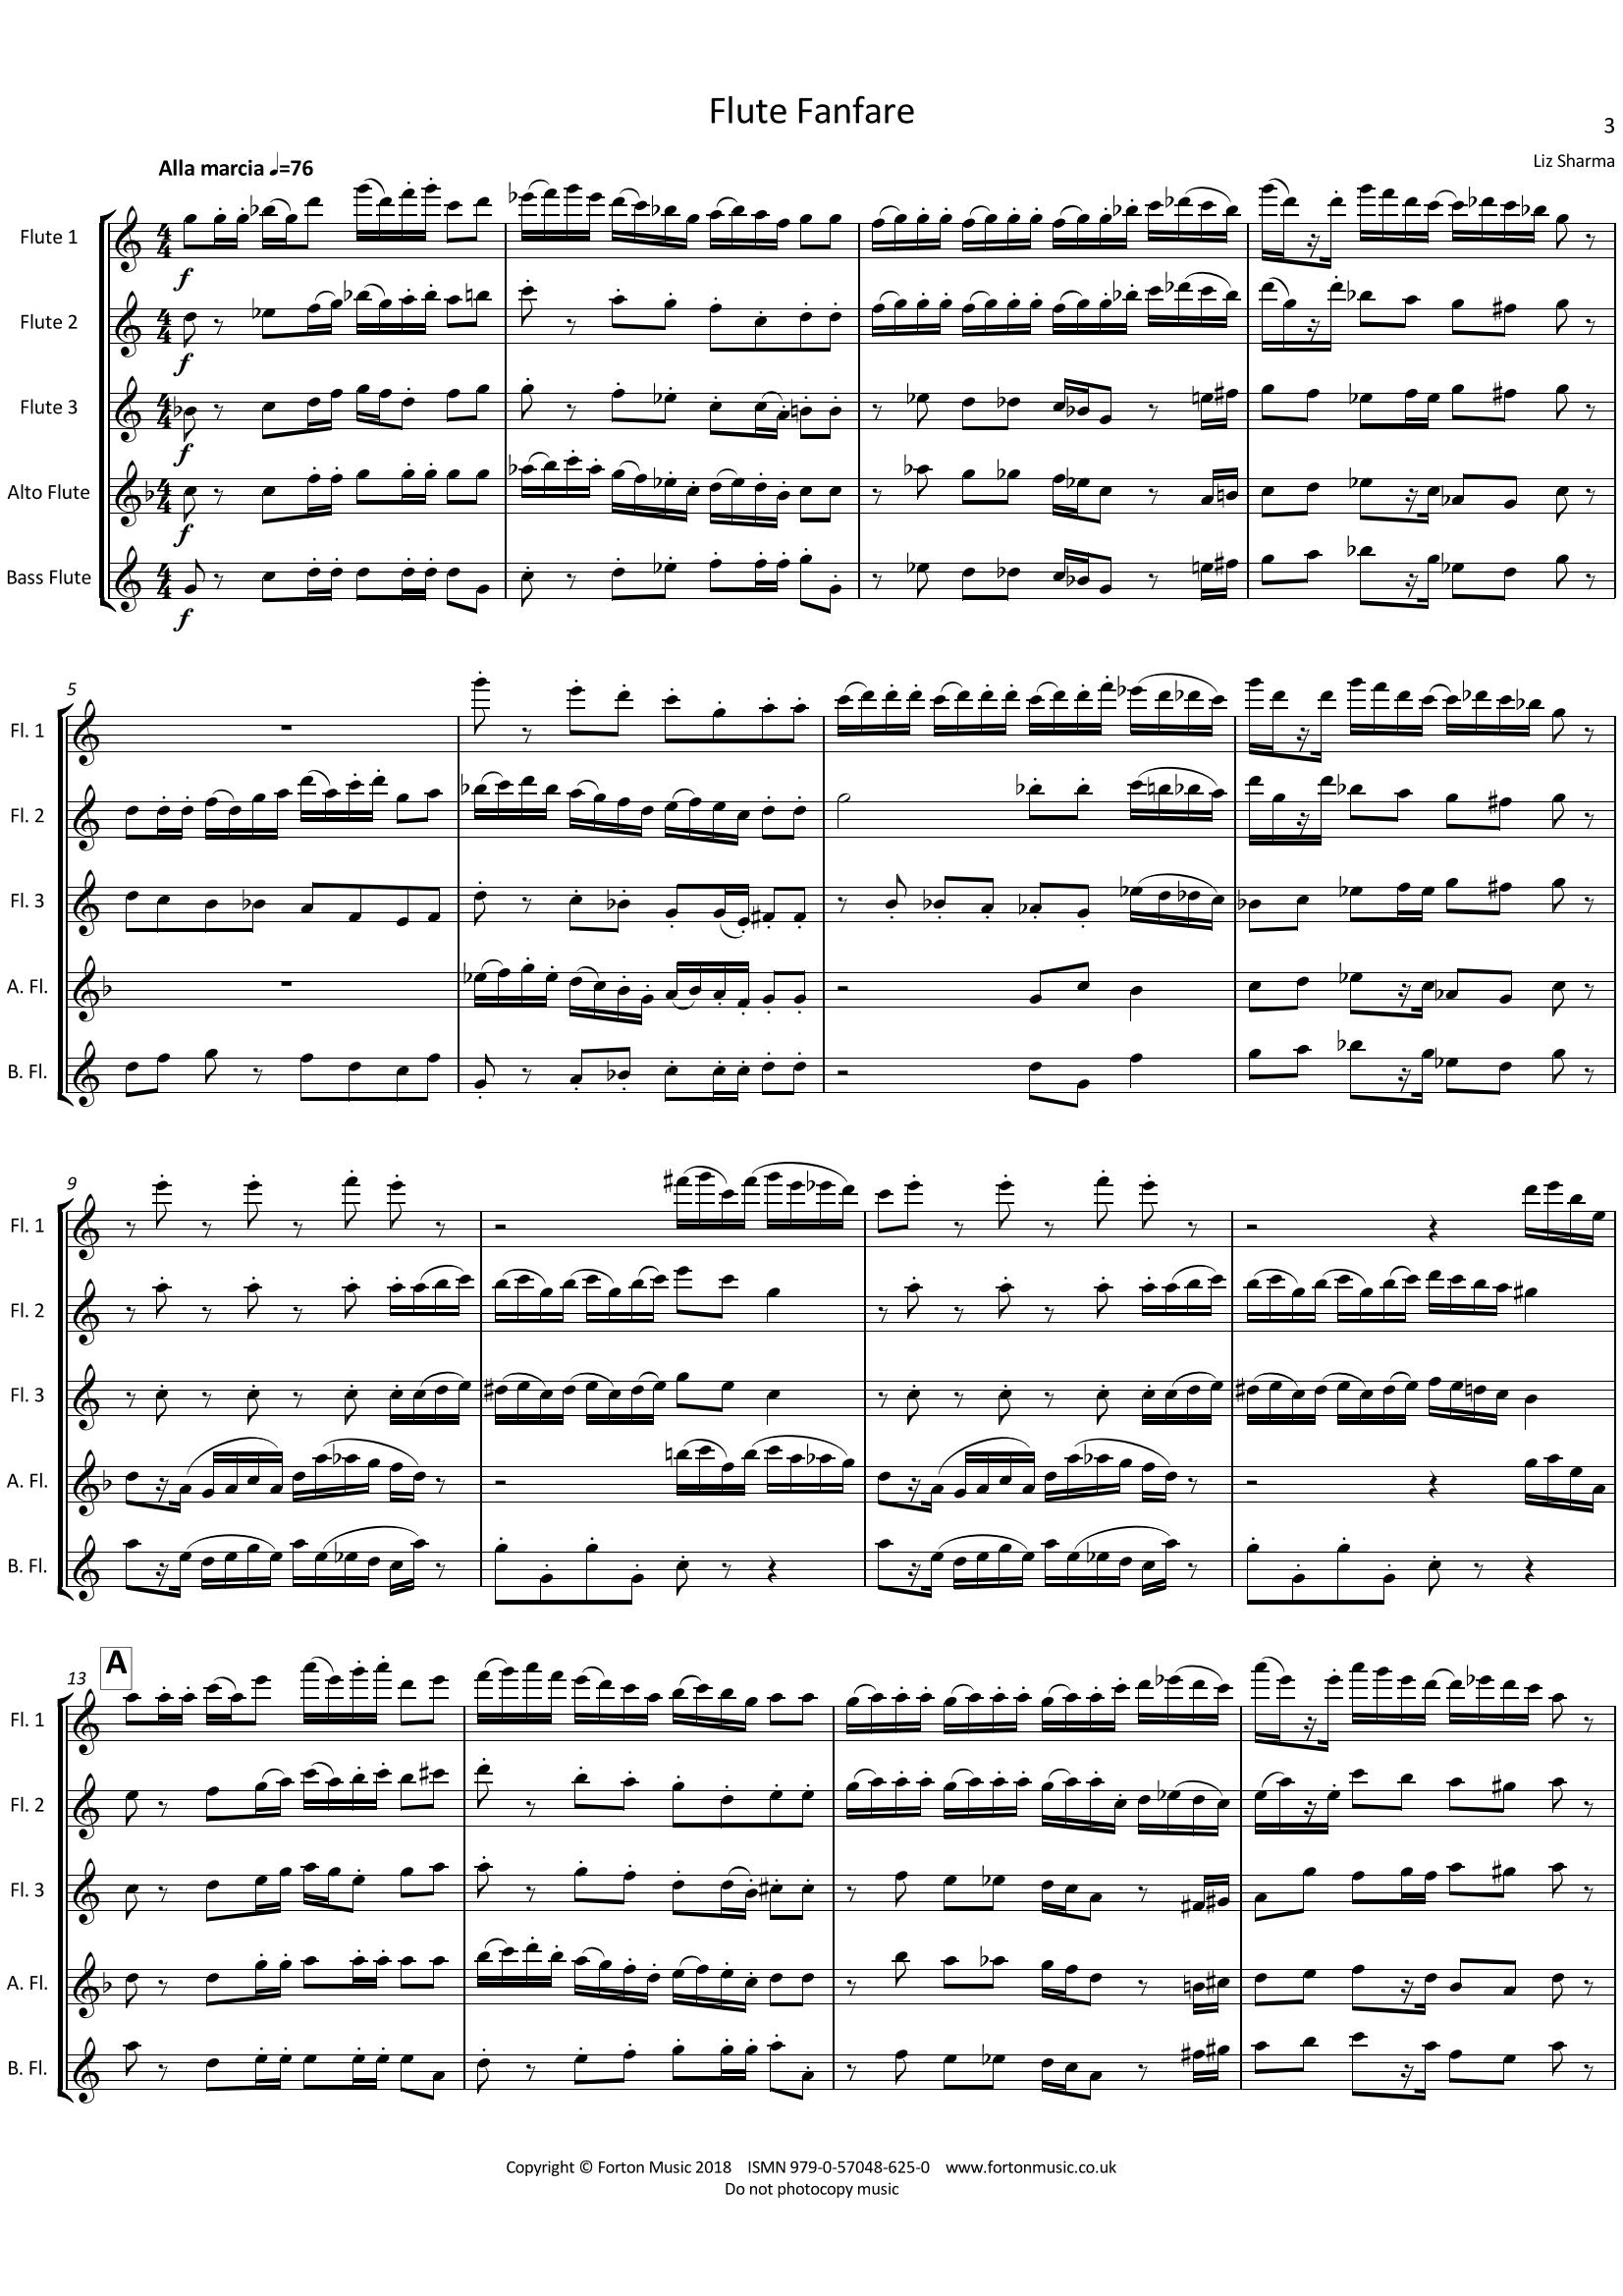 Flute Fanfare